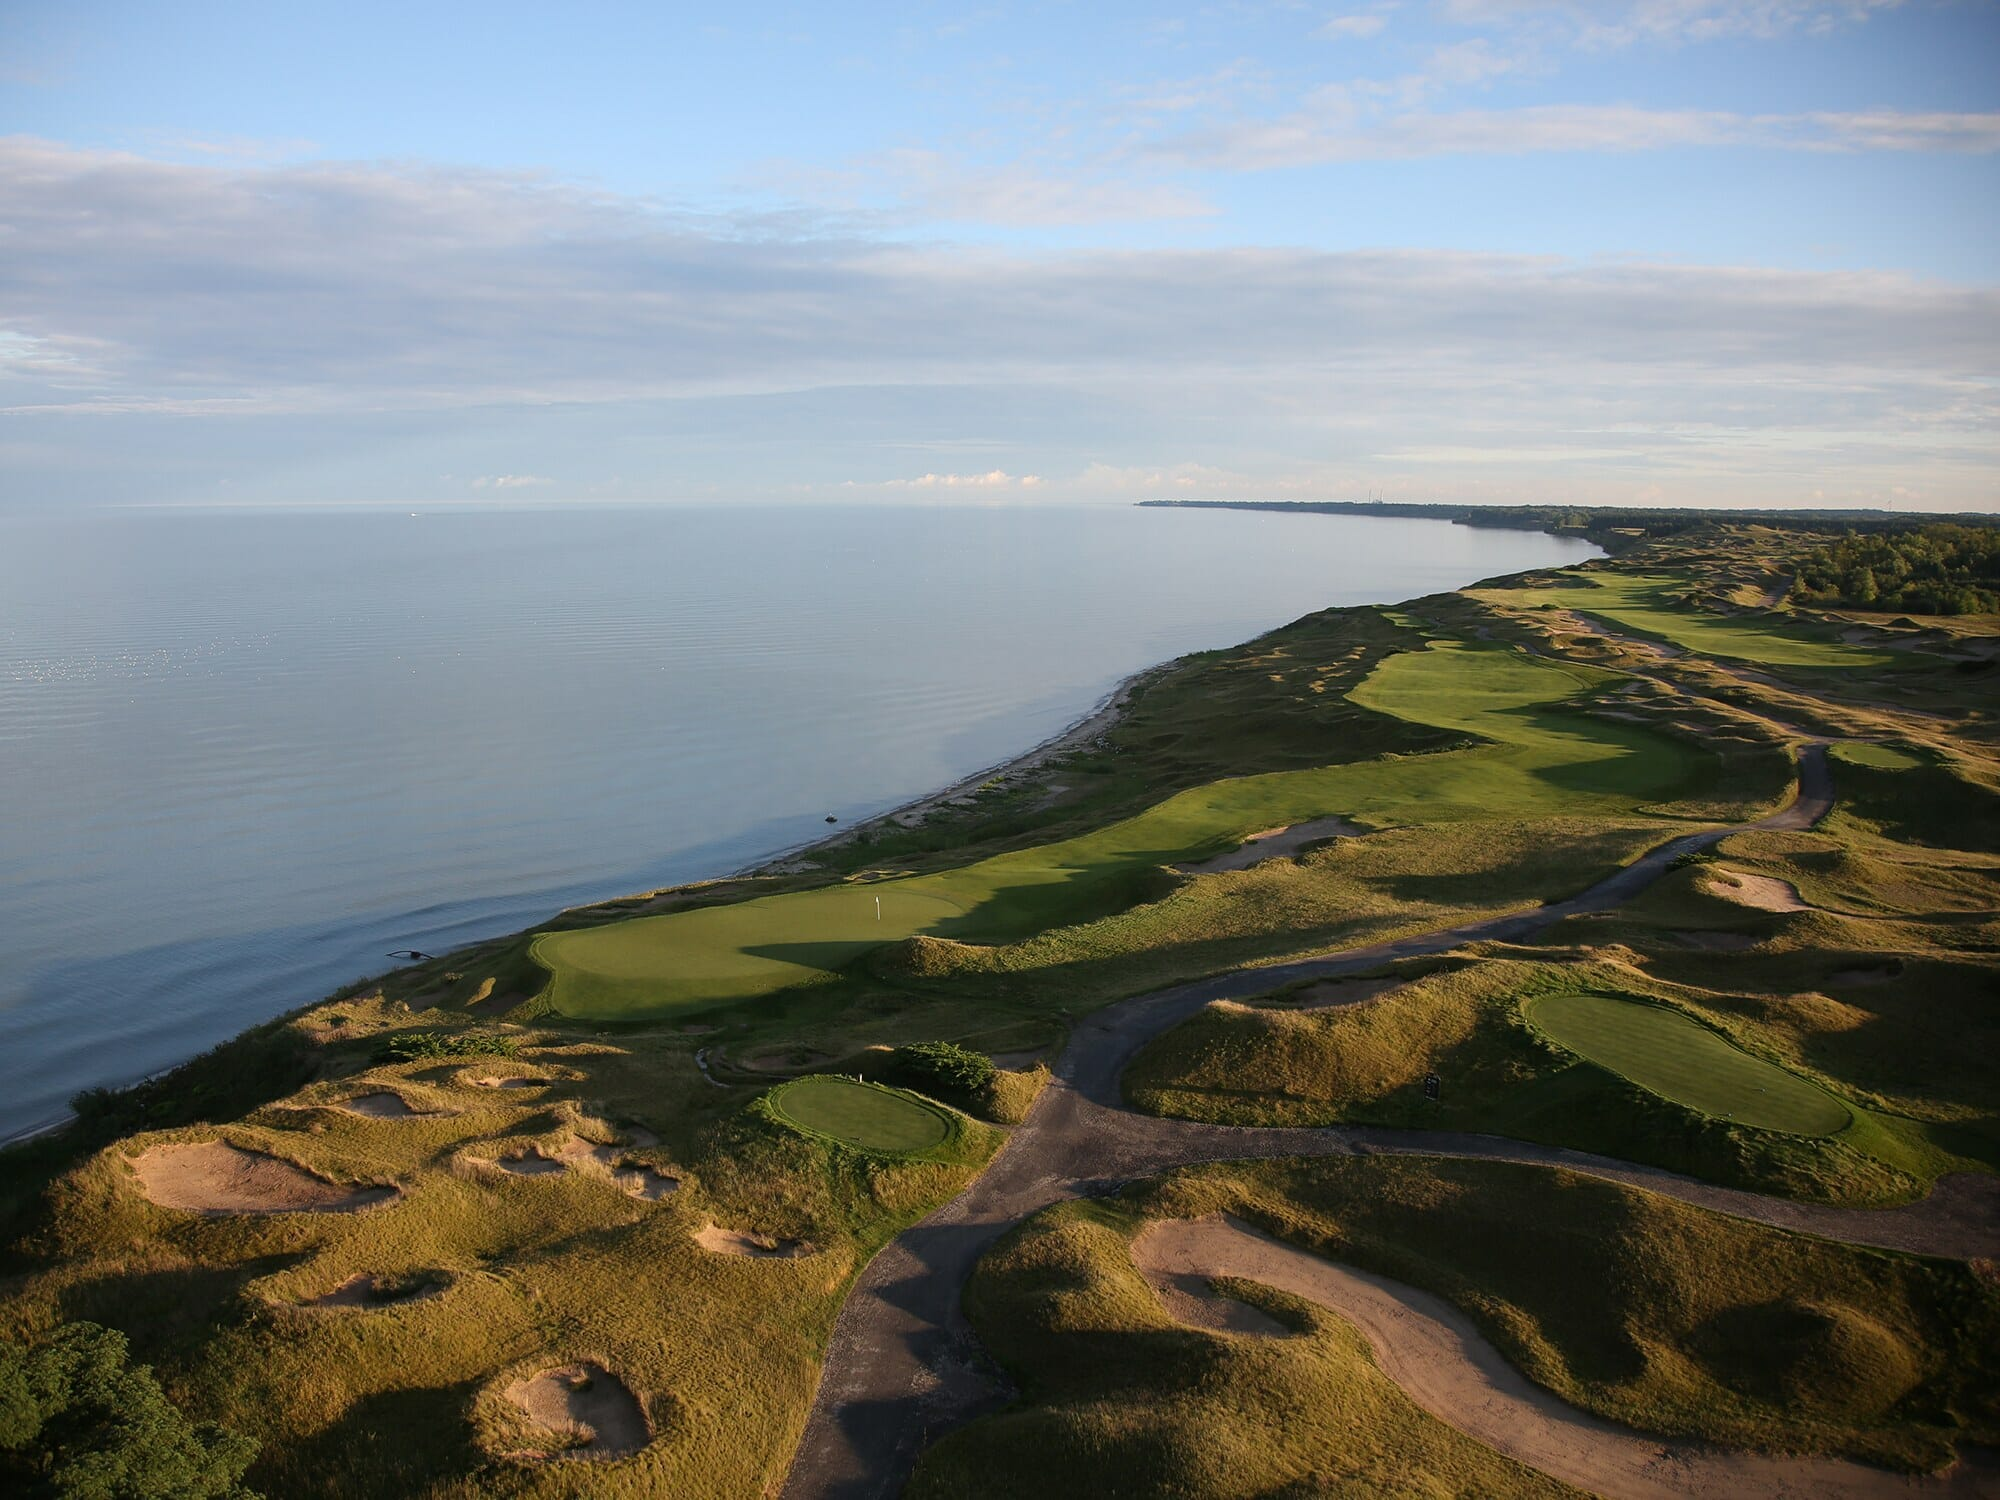 Aerial image of The Straits Golf Course next to Lake Michigan, Whistling Straits, Destination Kohler, Sheboygan, Wisconsin, USA